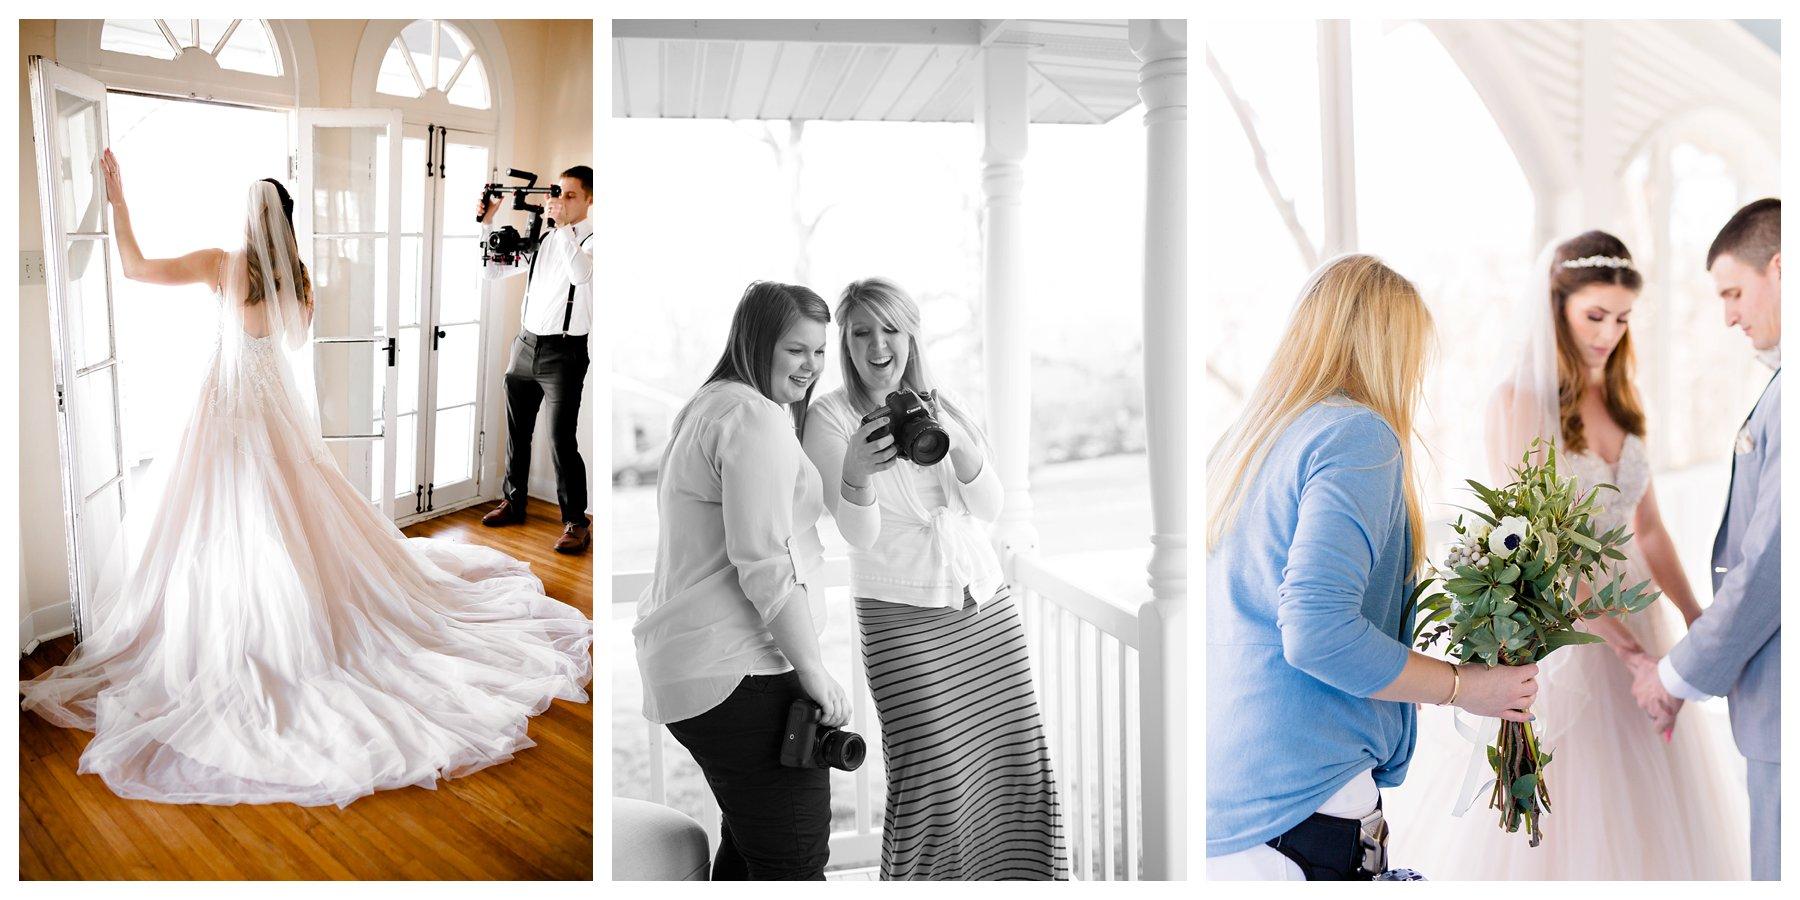 photographer_wedding_saint_louis_Kansas_City_Photography_Videography_workshop_training_styled_engagement_Lake_Ozark_KC_MO_STL_Rolla_Hermann_Saint_James_0351.jpg